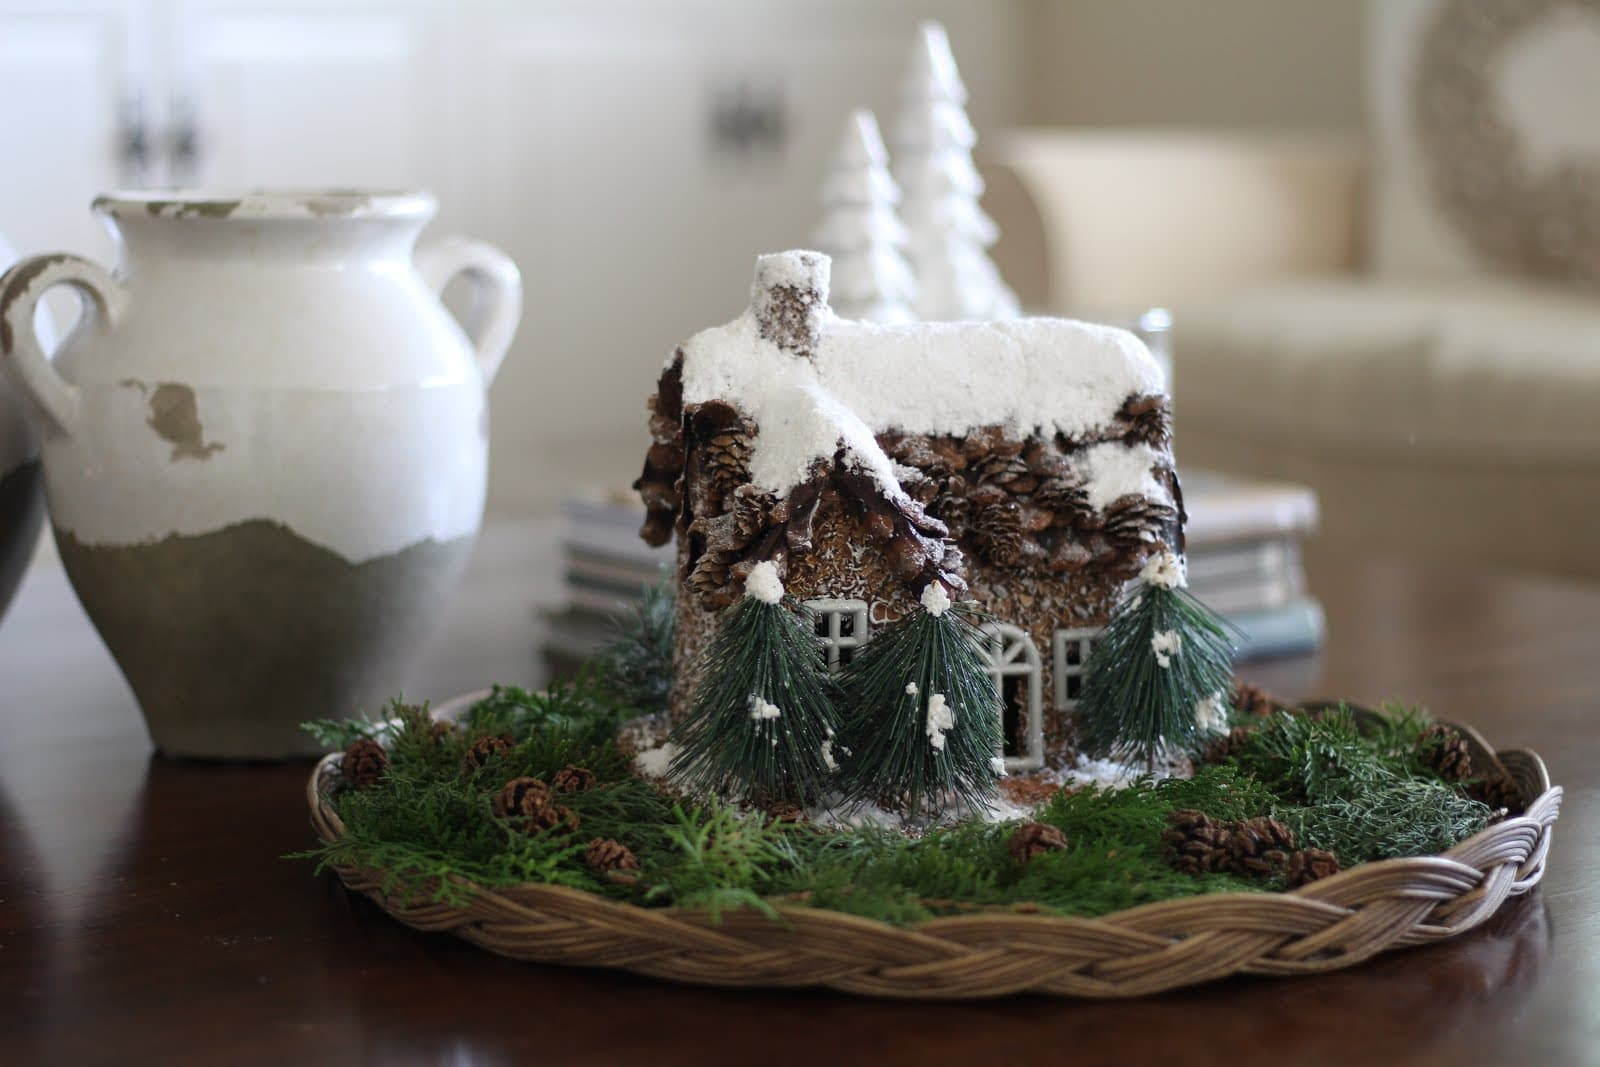 Pottery barn tree skirts -  Pottery Barn Tree Skirt Latest